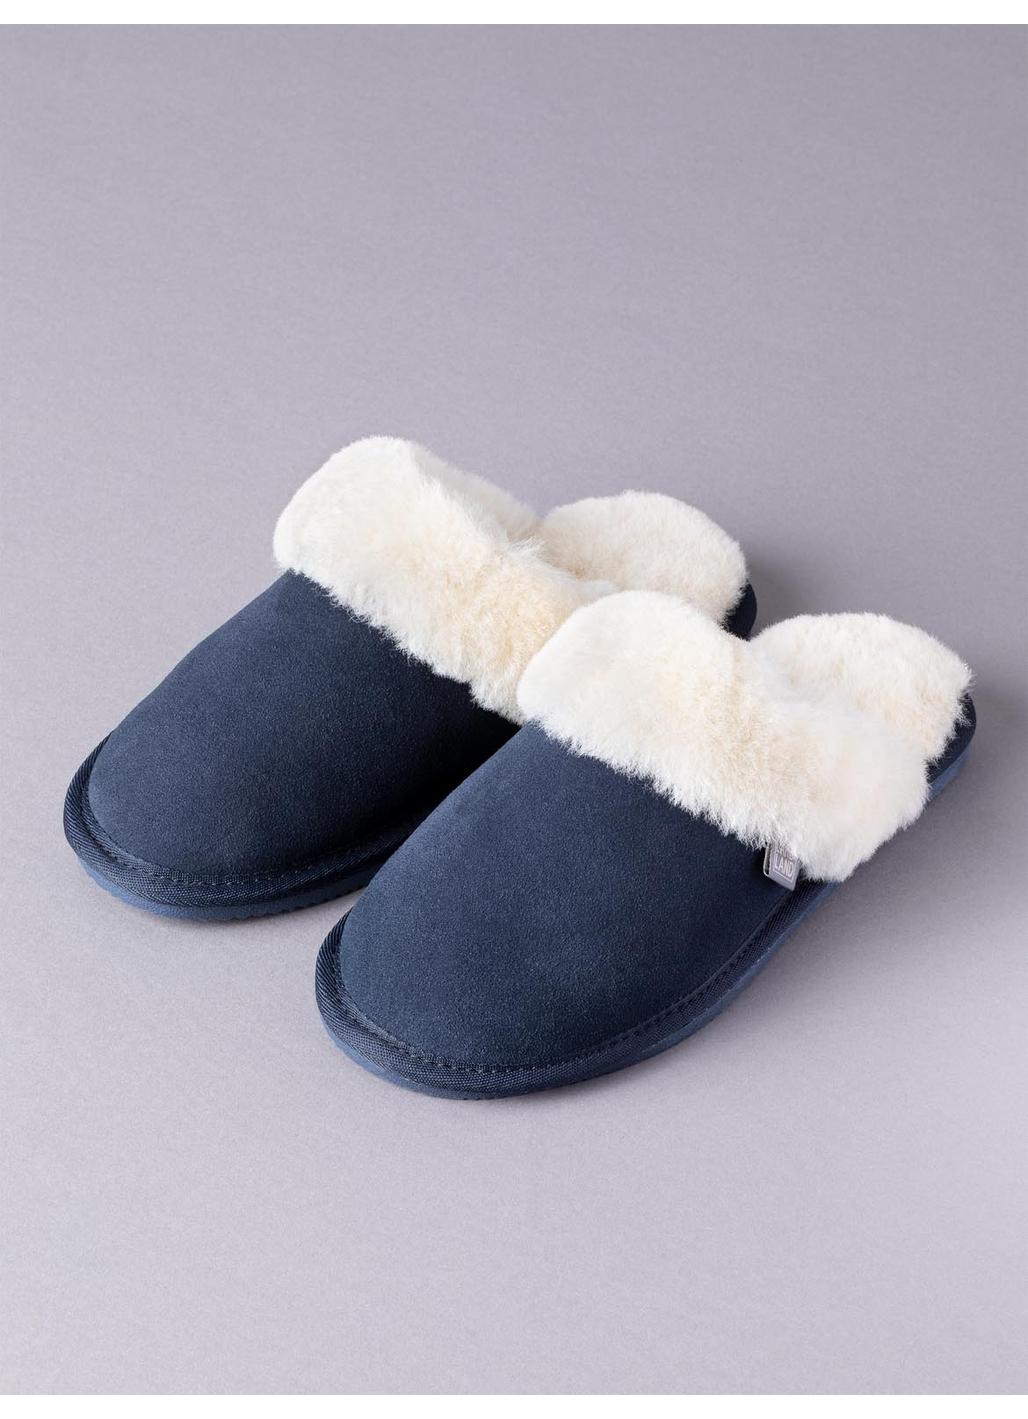 Ladies' Sheepskin Slider Slippers in Navy